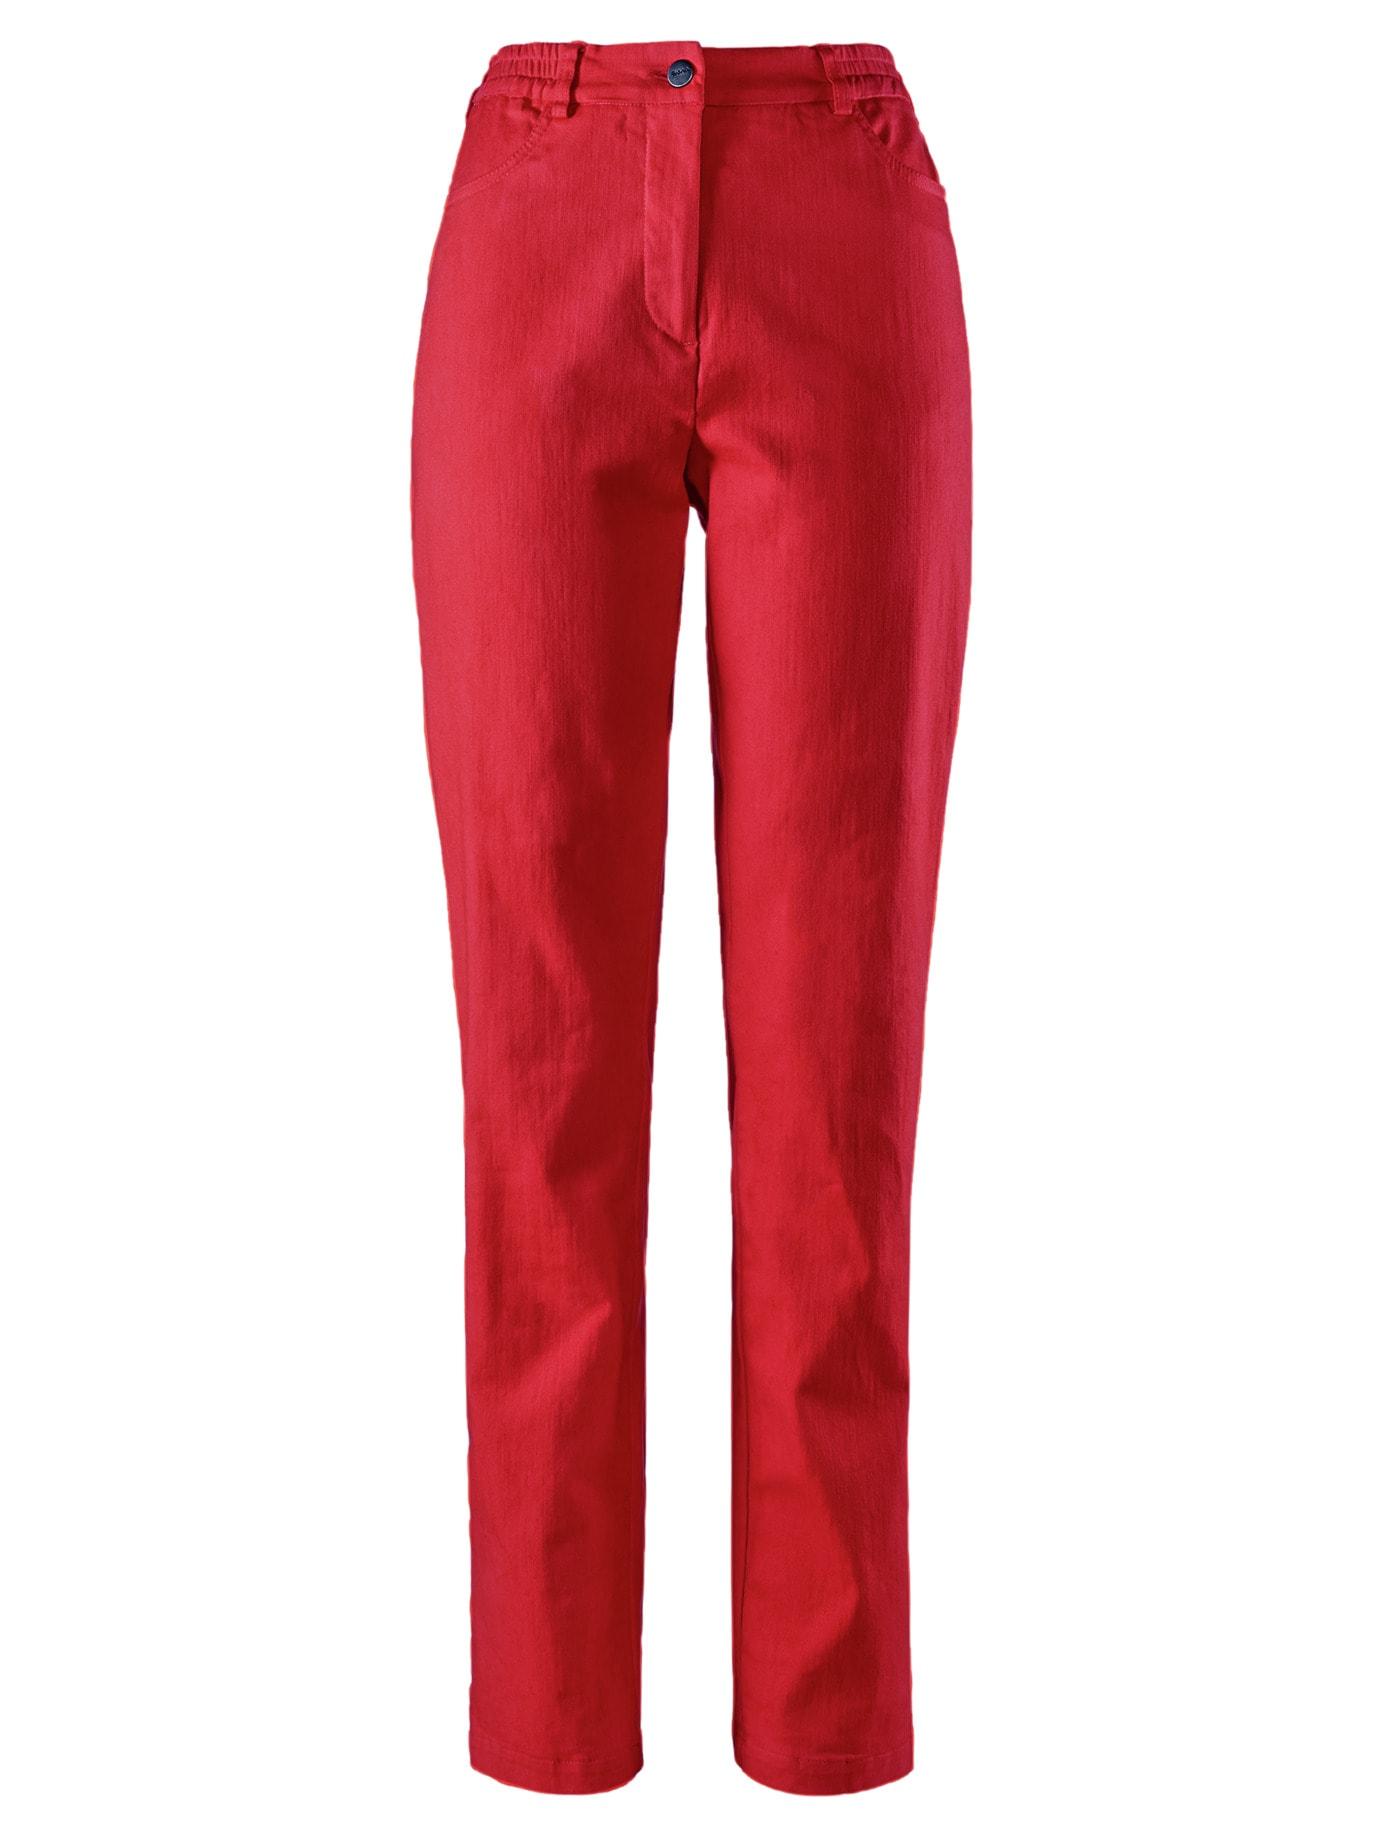 Avena Damen Powerstretch-Hose feminin Rot 44-5343-7